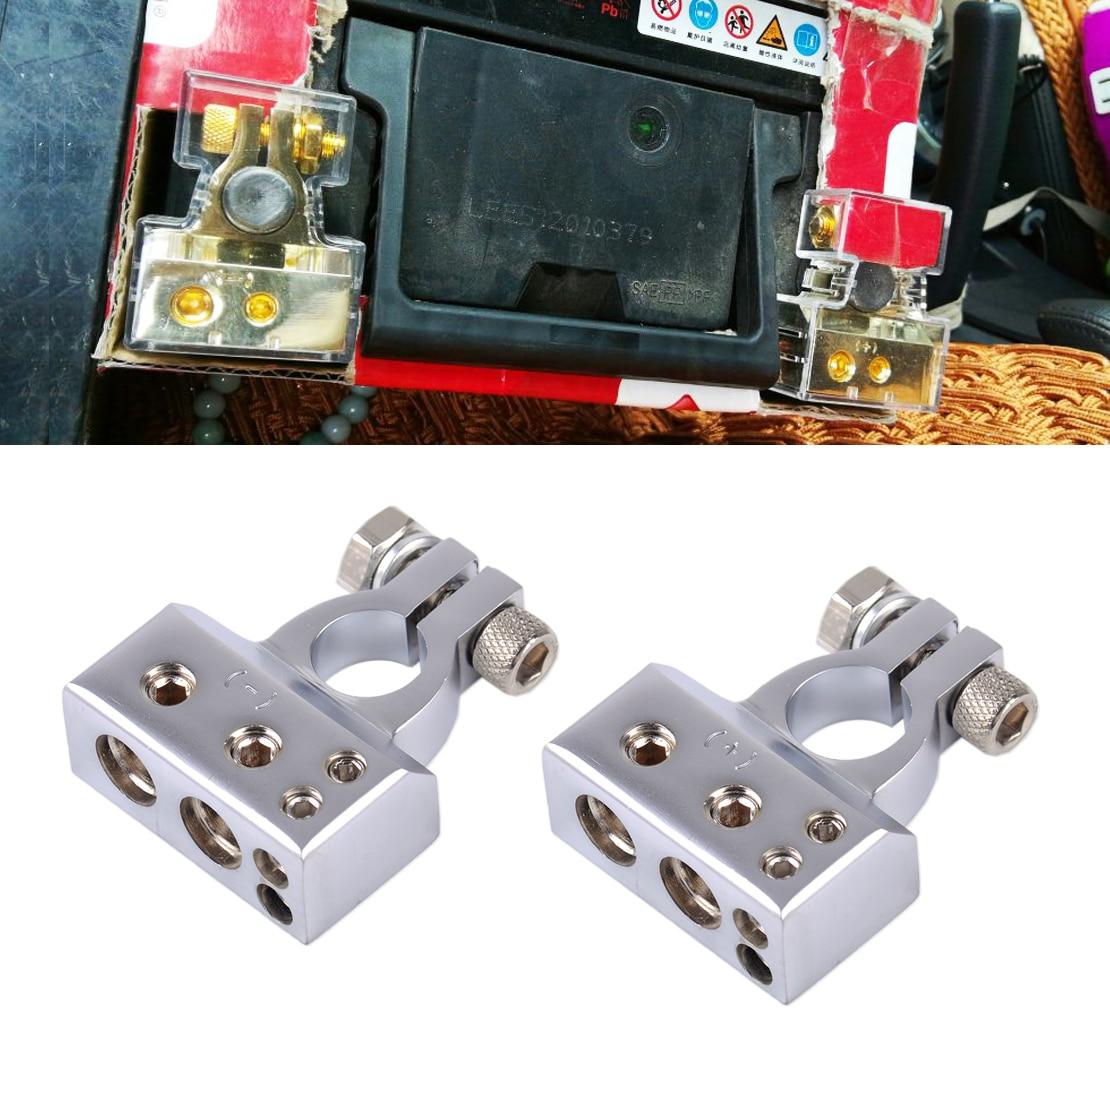 Dwcx 2pcs 12v silver 2 4 8 gauge awg positive negative car battery terminal clamp